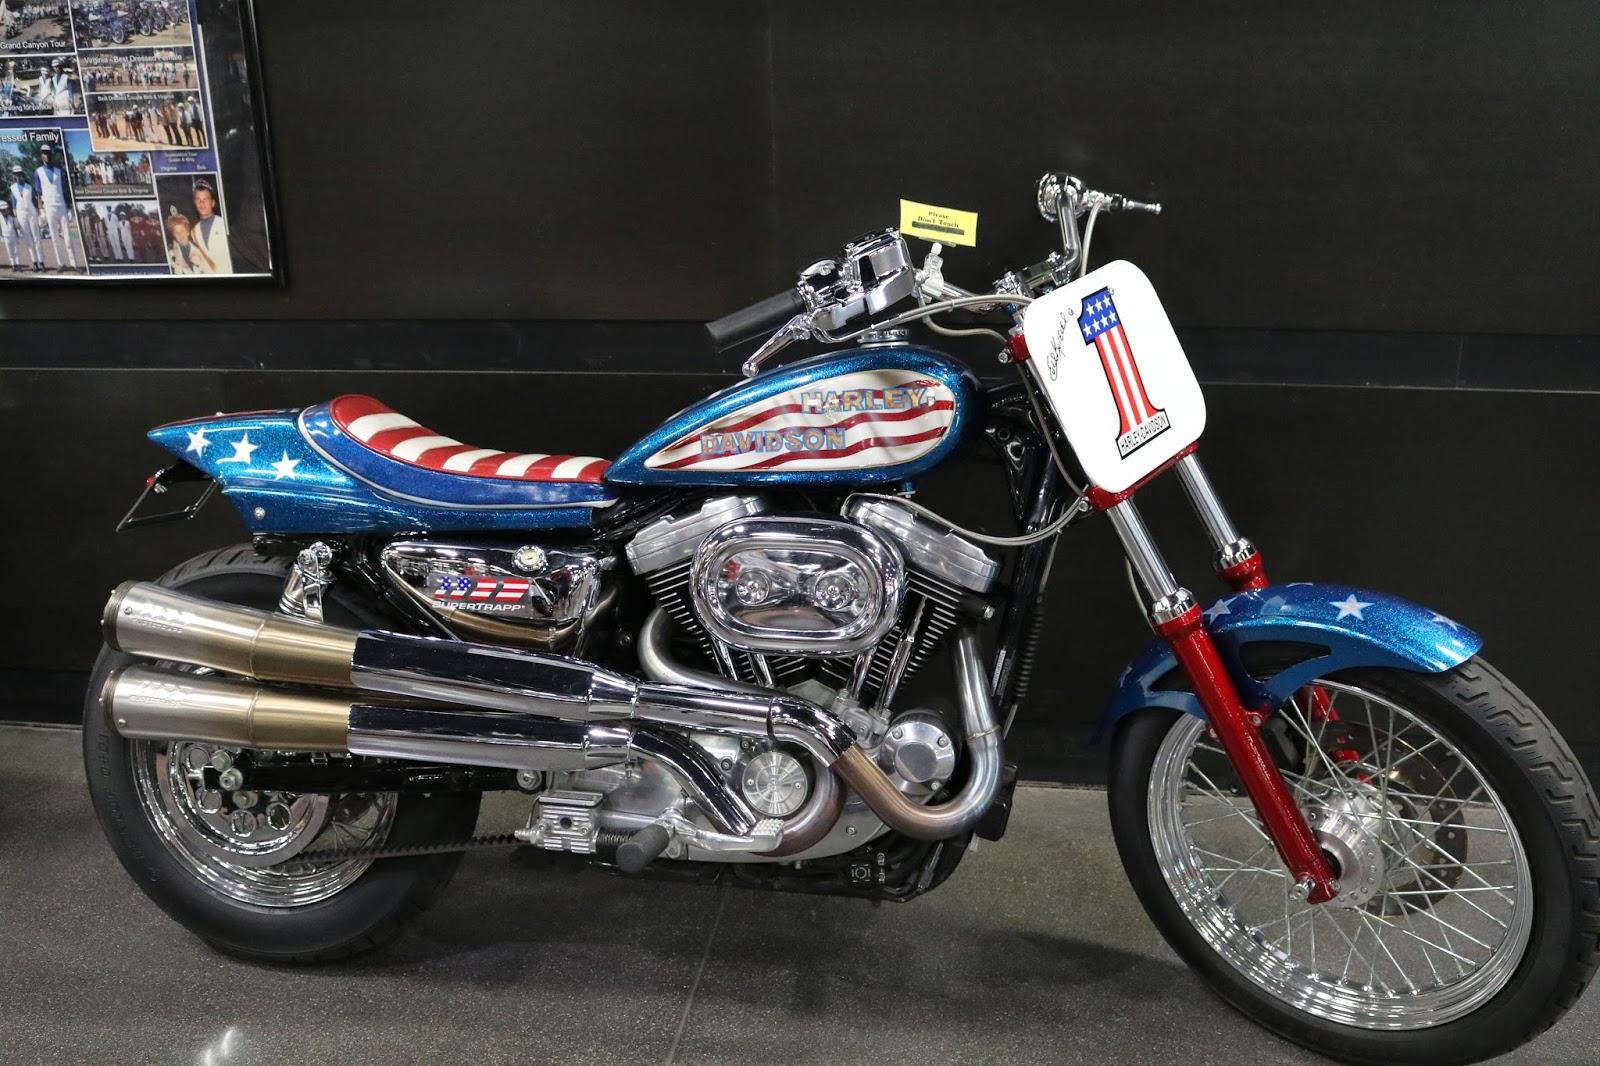 Evel Knievel Bike At Bonham S Las Vegas Moto Auction: OldMotoDude: Harley-Davidson Sportster Evel Knievel